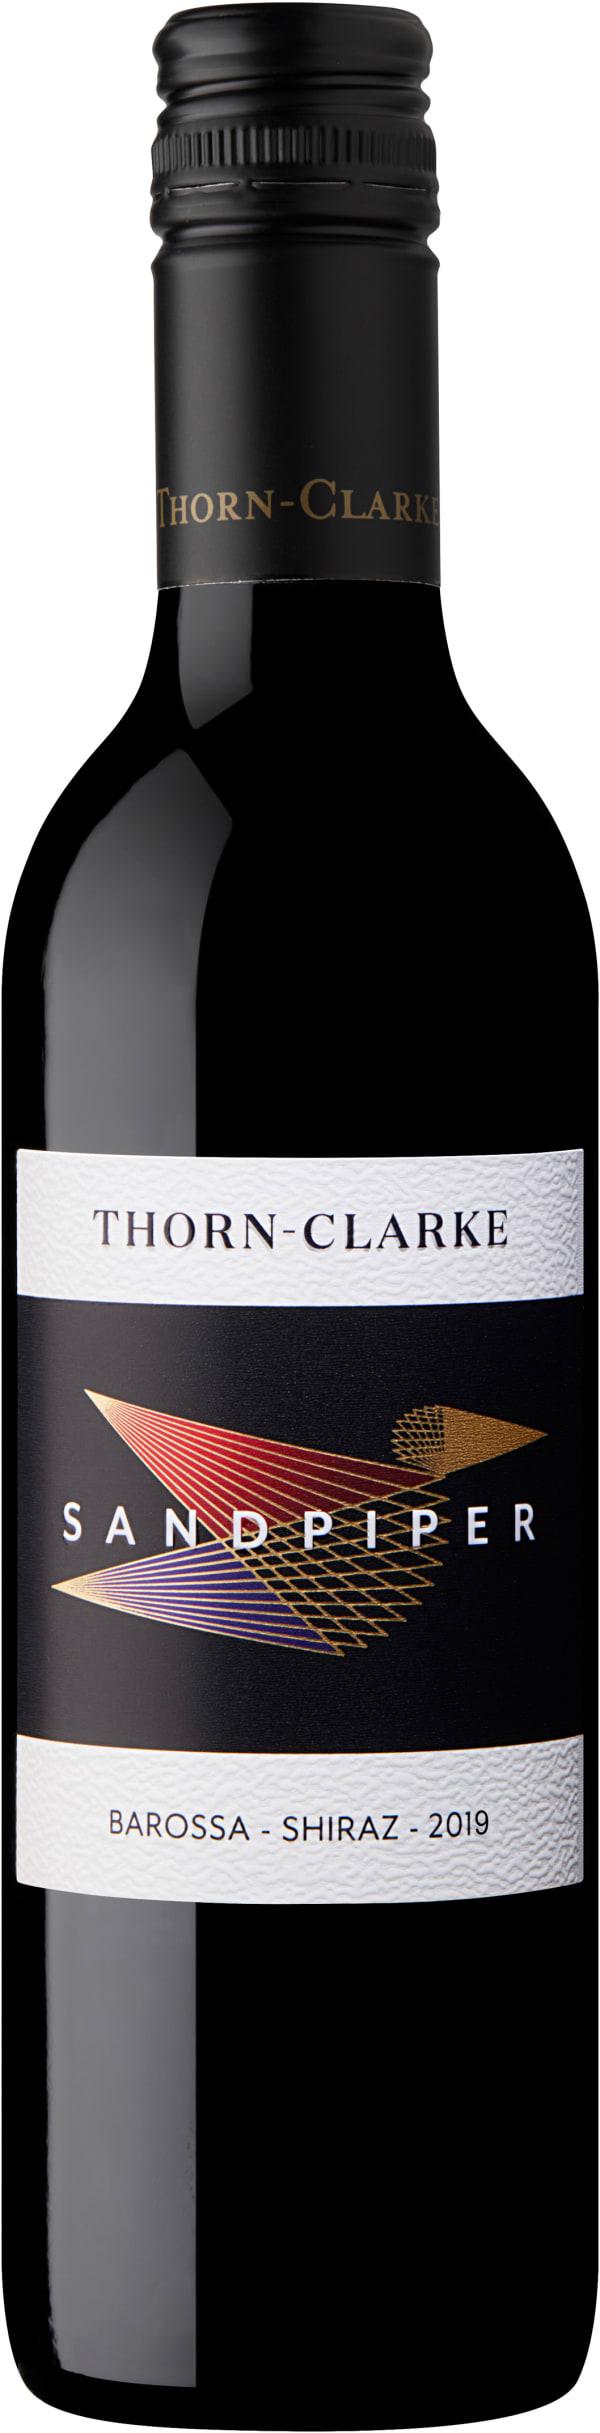 Sandpiper Barossa Shiraz 2018